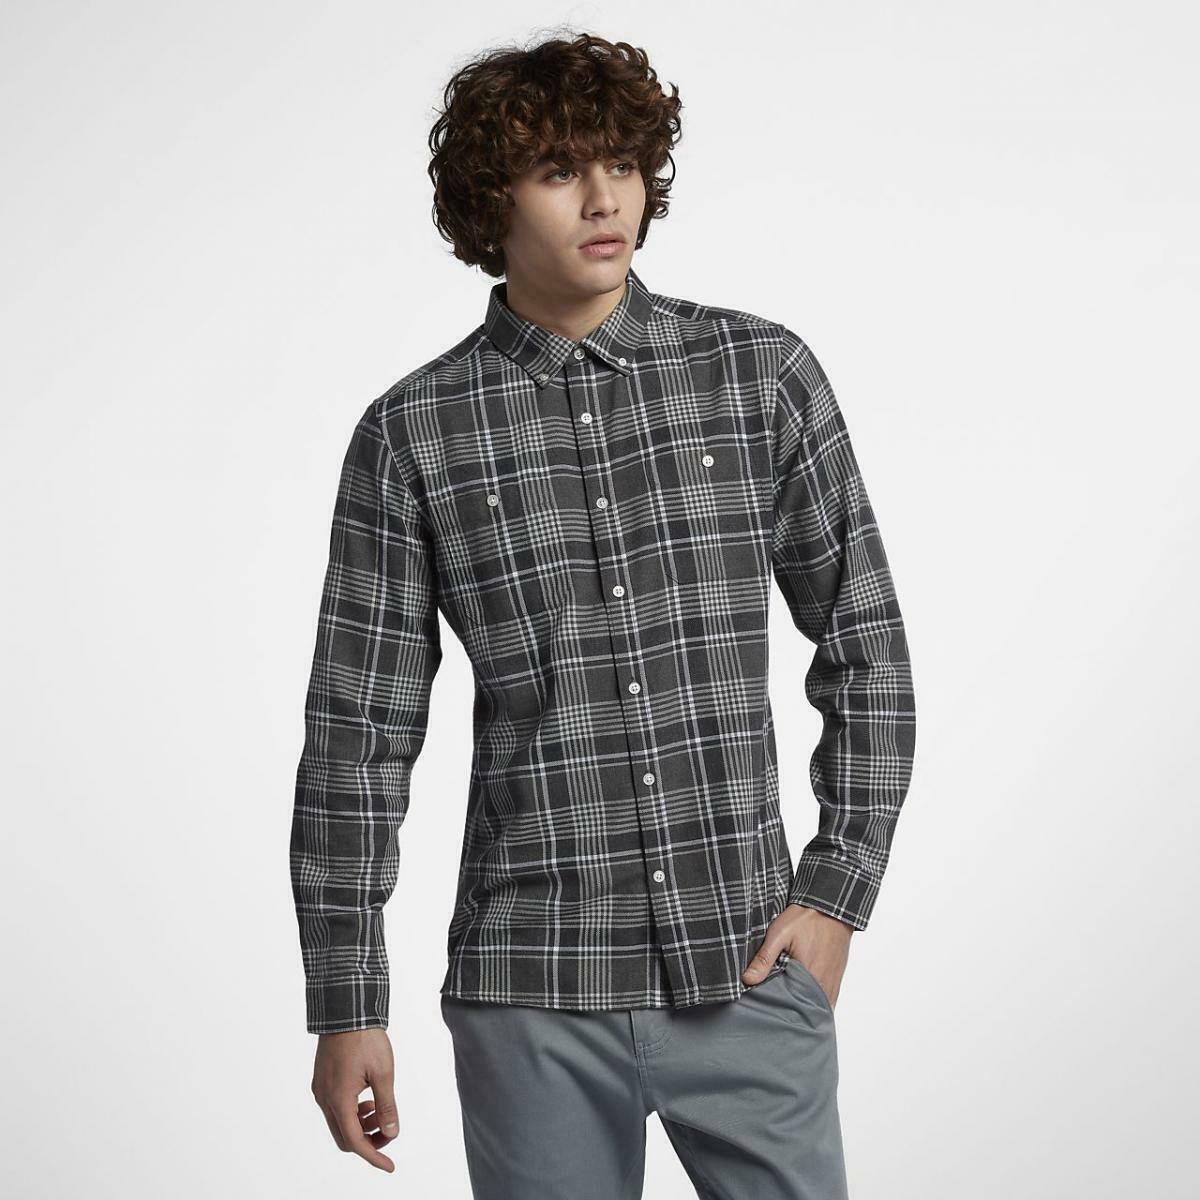 Under Armour 1345989 Men/'s UA Tradesman Flannel 2.0 Long Sleeve Shirt Black